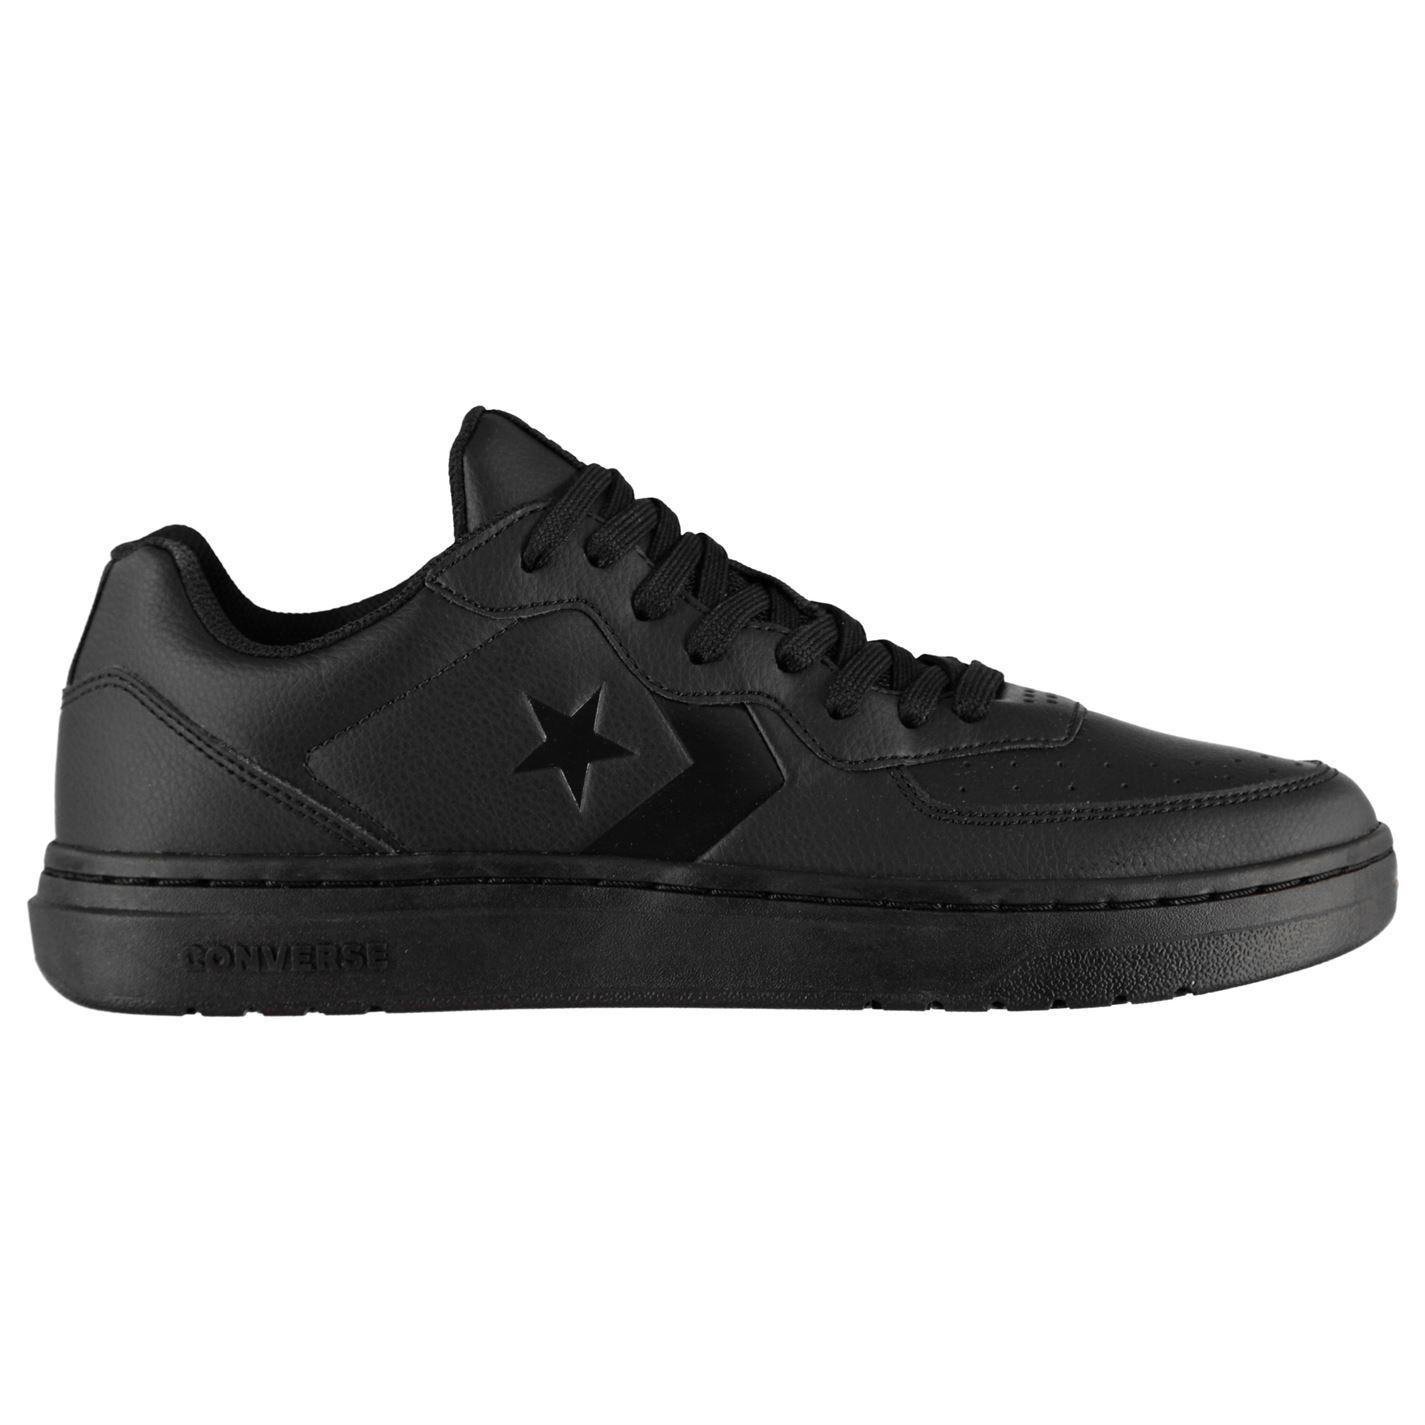 Converse-Ox-Rival-Cuir-Baskets-Pour-Homme-Chaussures-De-Loisirs-Chaussures-Baskets miniature 4